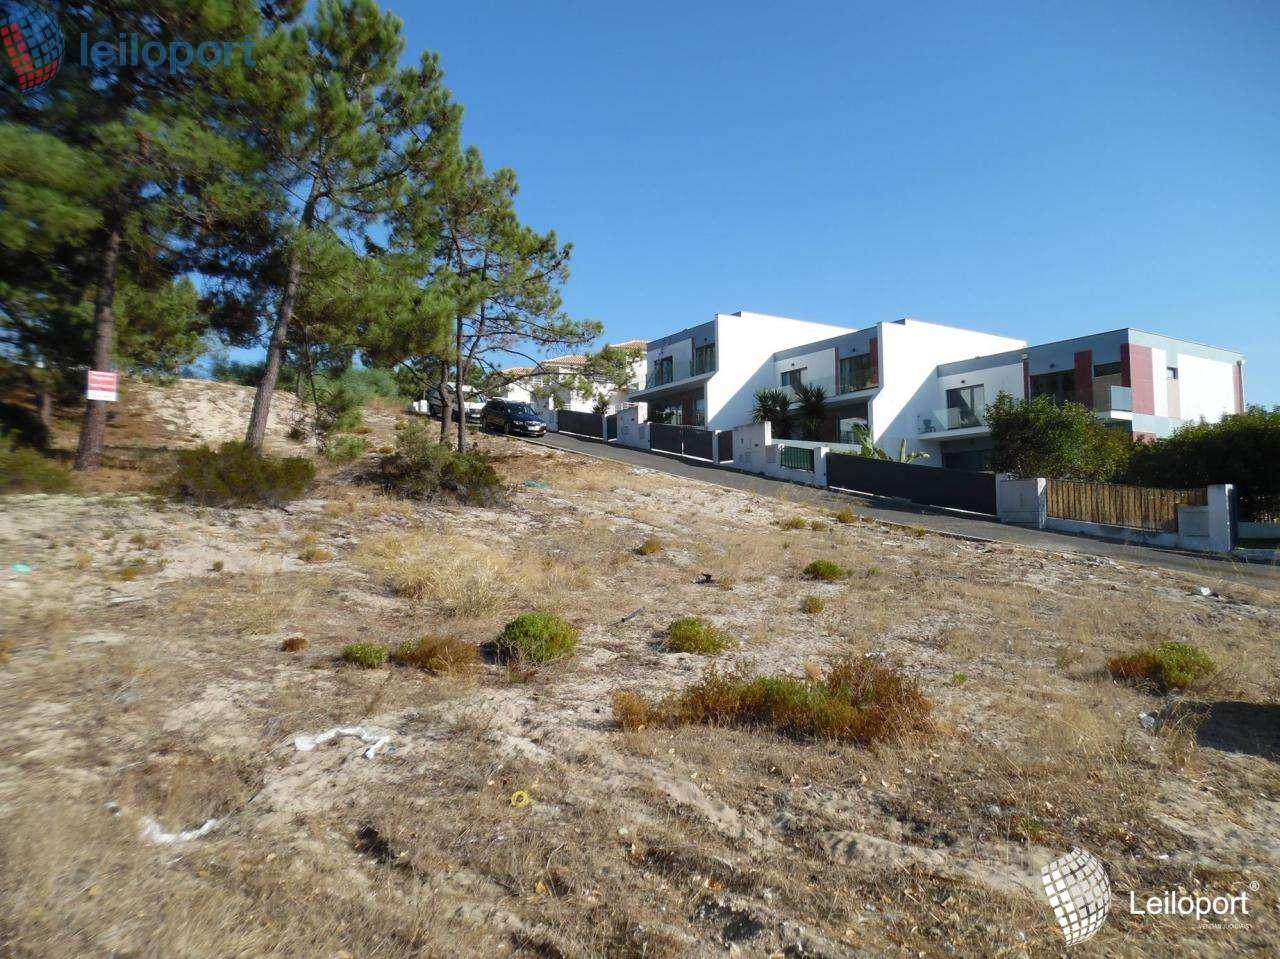 Terreno para comprar, Carvalhal, Setúbal - Foto 5